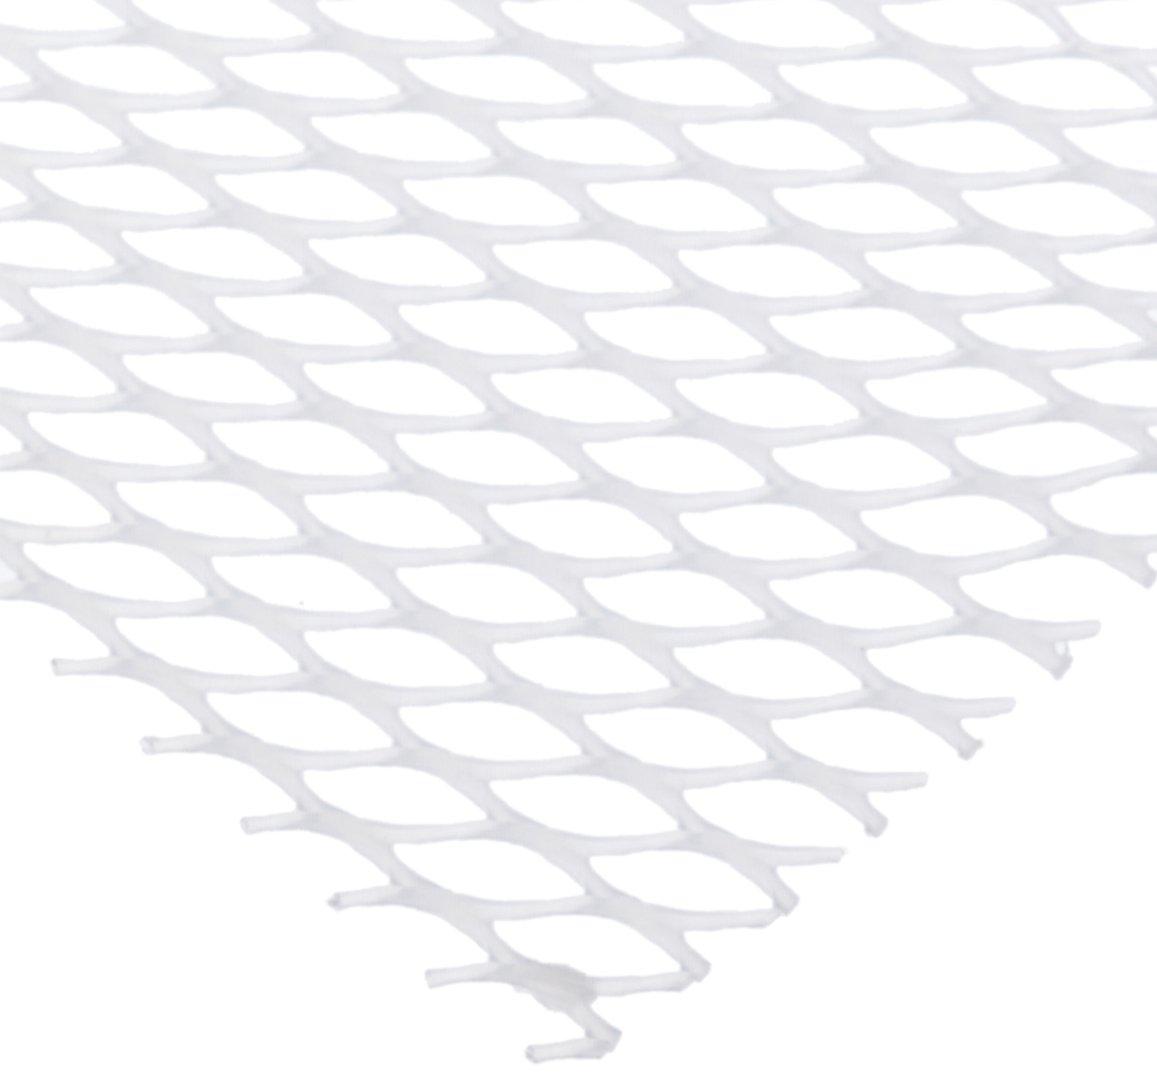 San Jamar PL0403 Poly-Liner Glossy Finish Soft Shelf Liner, 40' Length x 2' Width, Clear